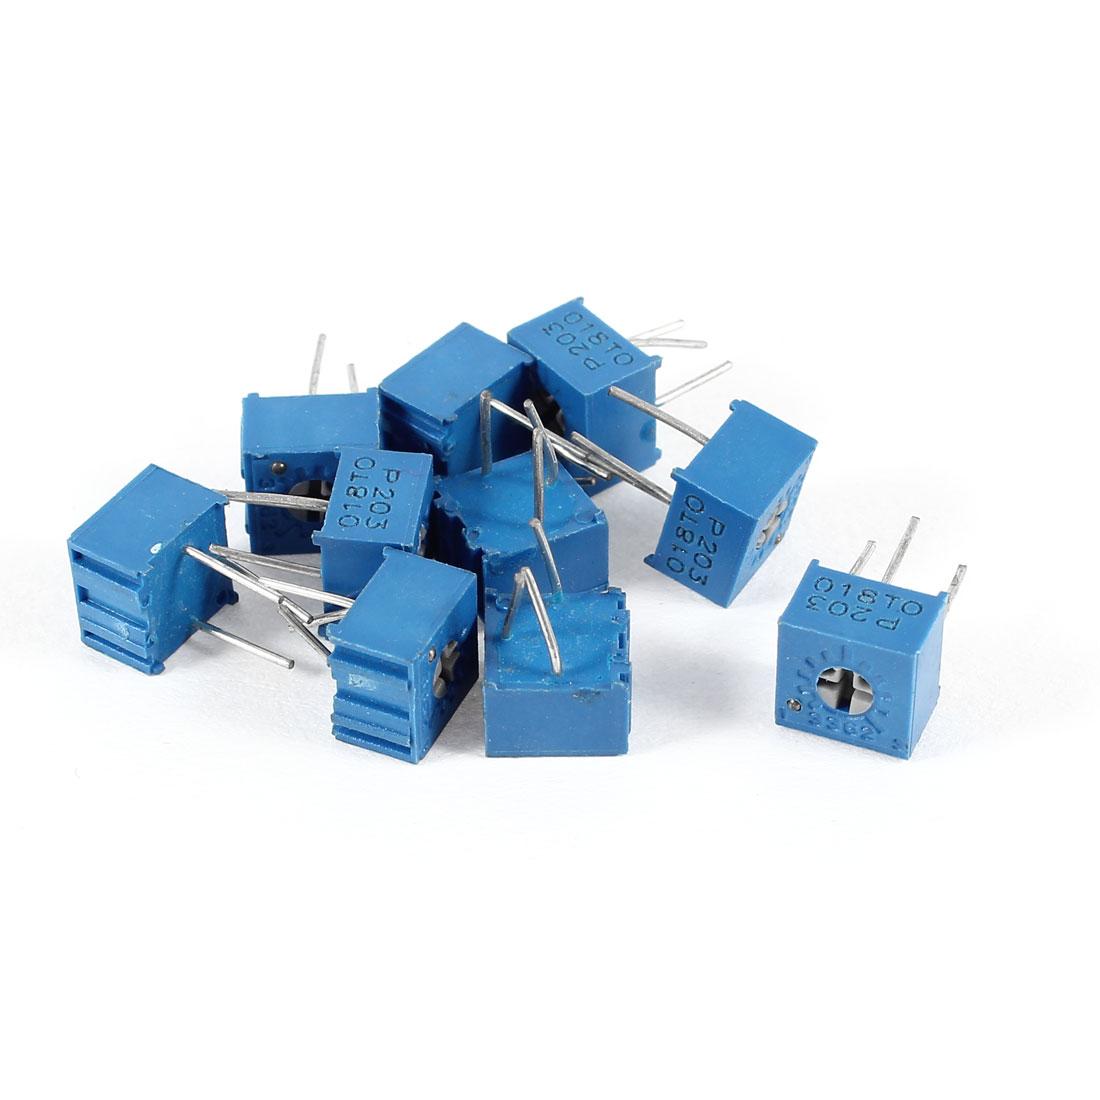 10 Pcs Potentiometer Trimmer Trimpot Variable Resistor 3362P-203 20K Ohm